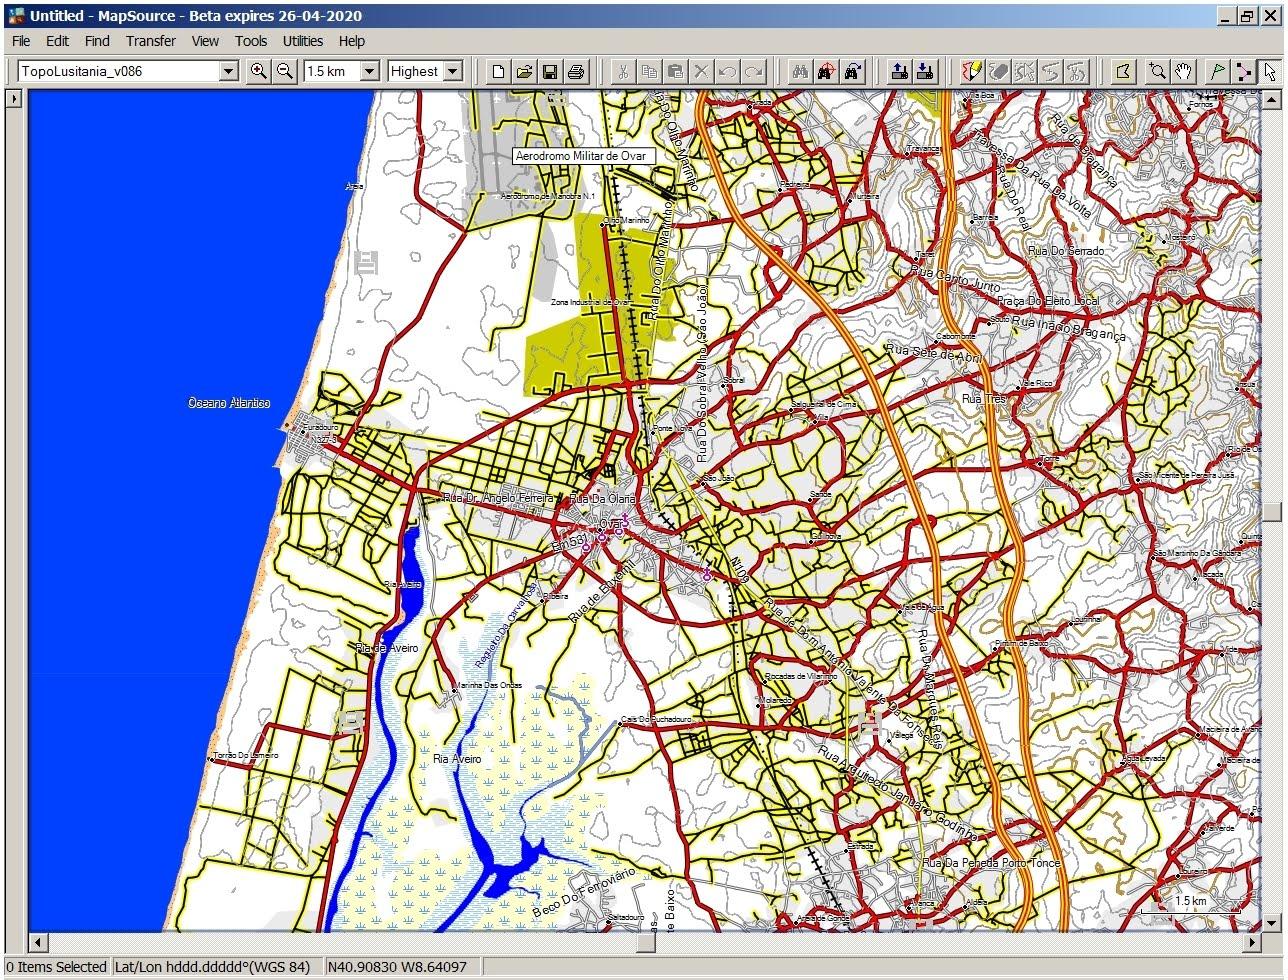 mapa gps portugal TopoLusitania   Mapa Topográfico de Portugal para GPS em formato  mapa gps portugal